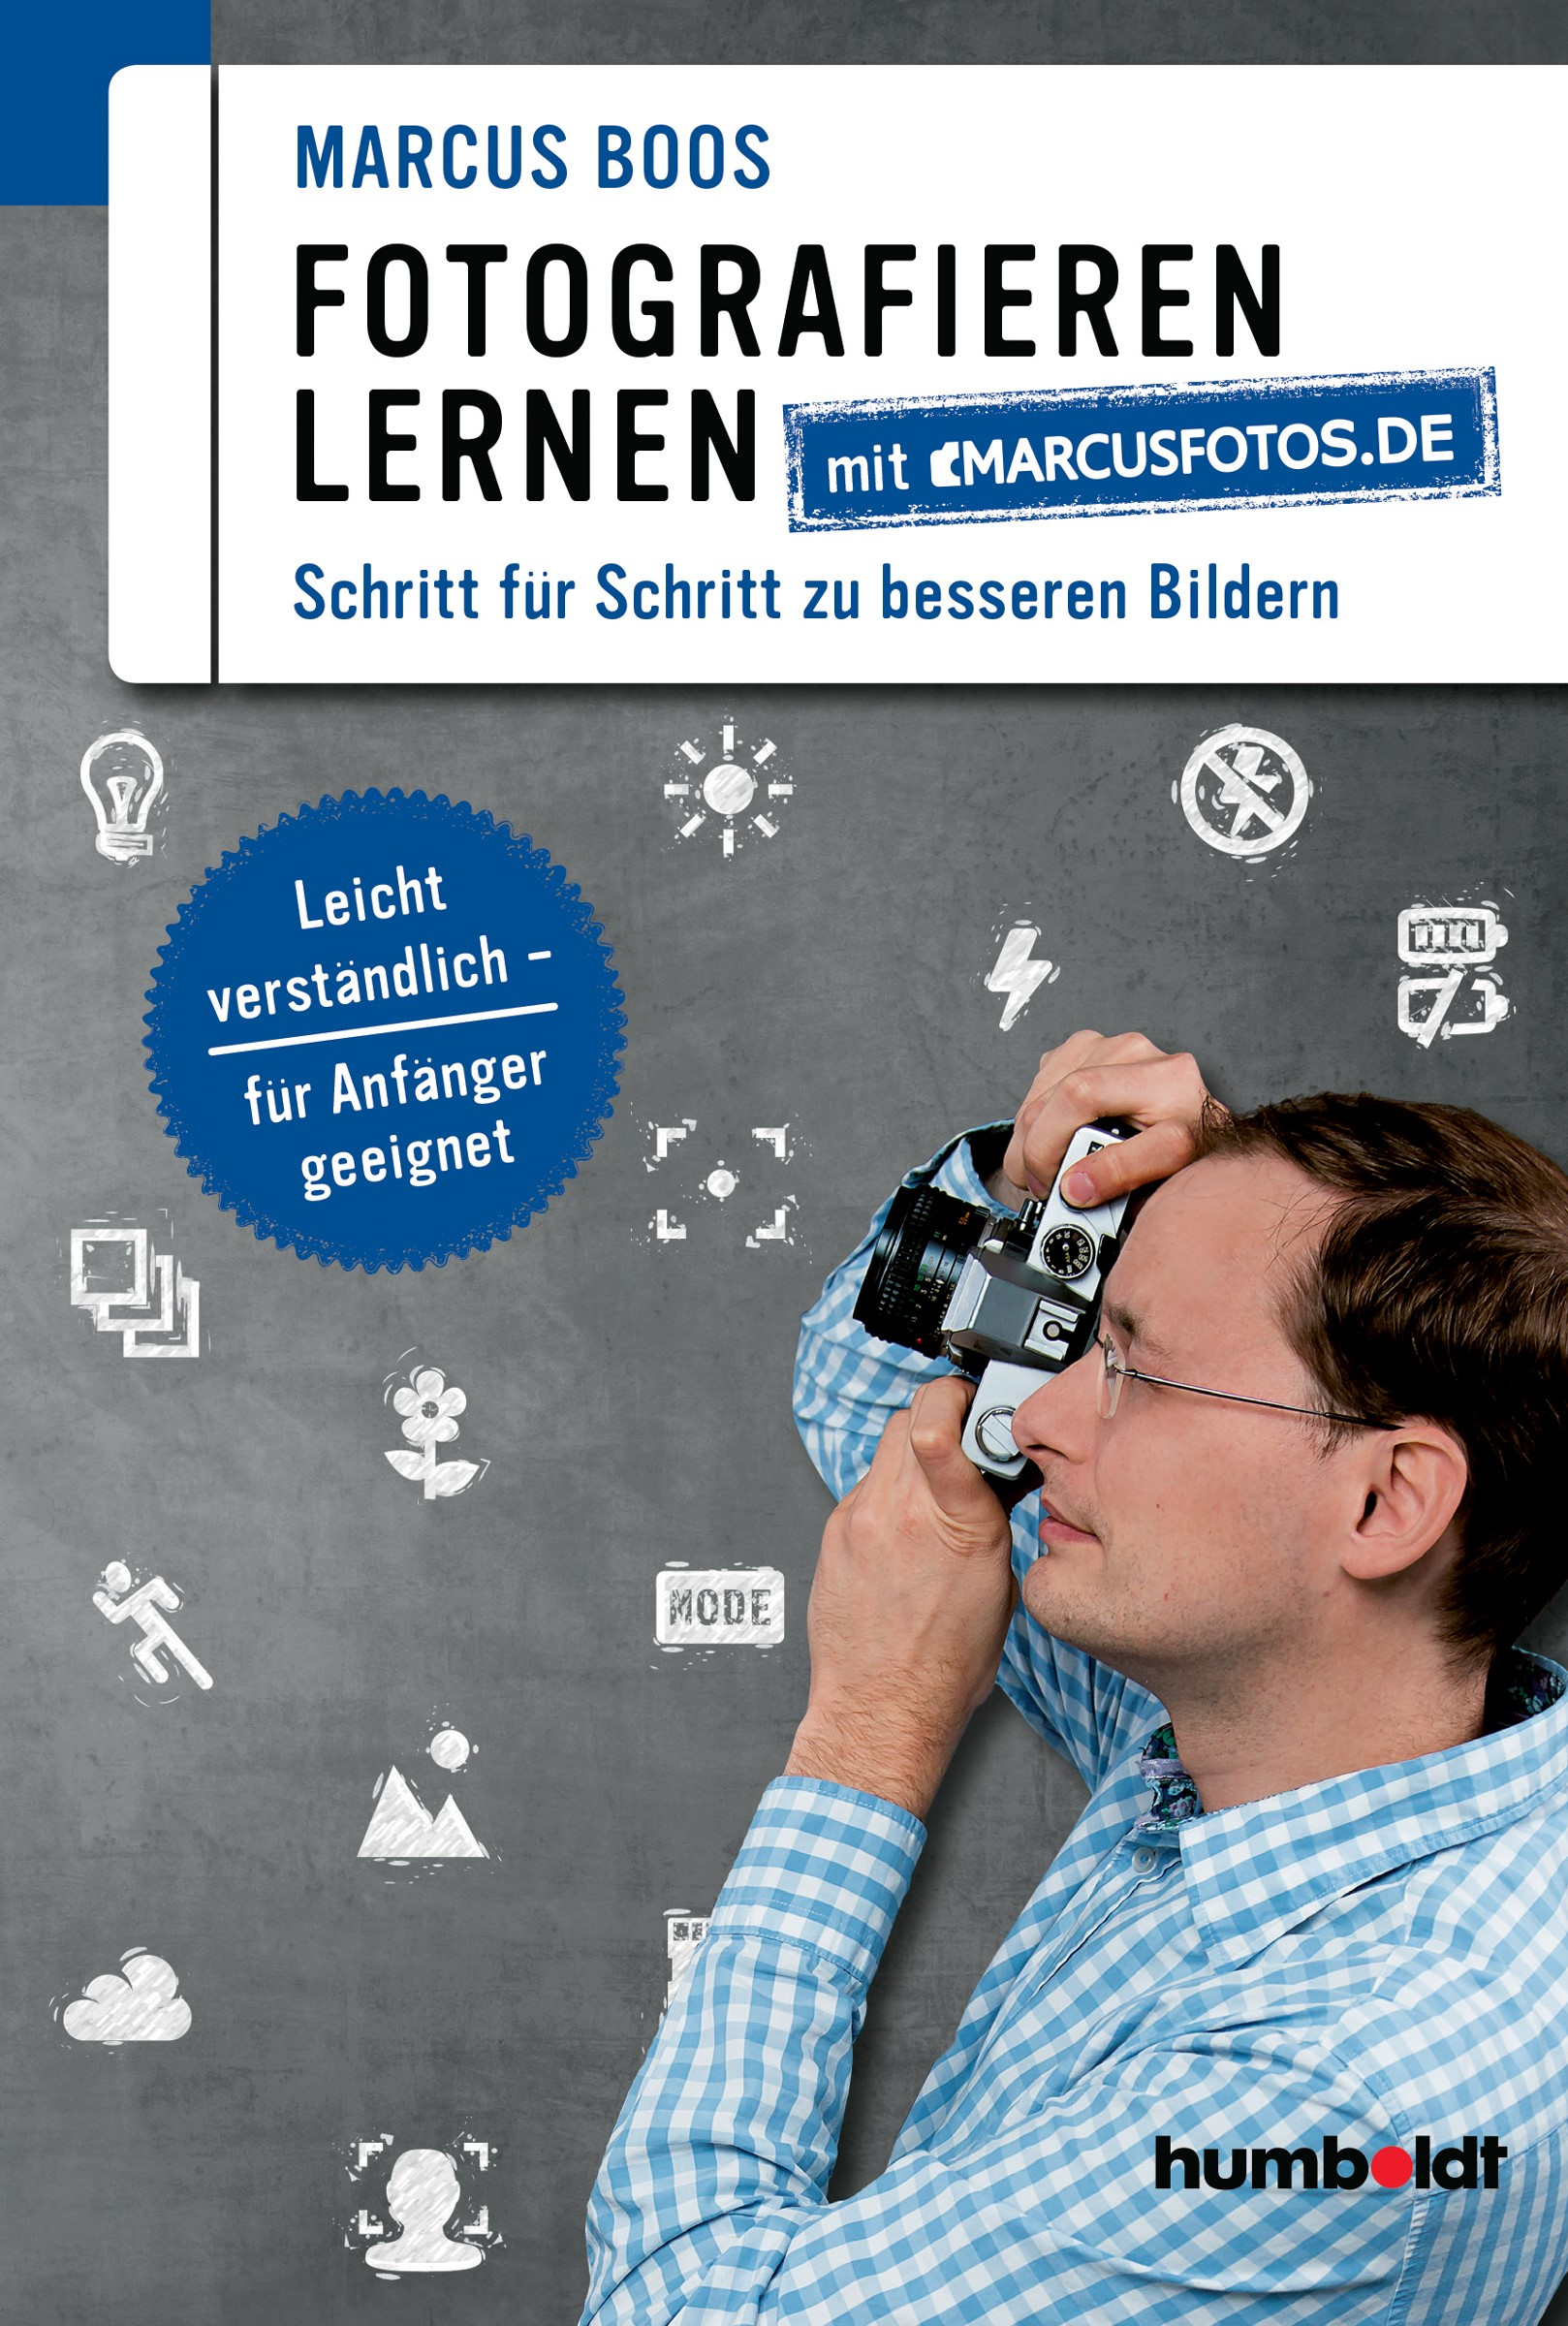 Fotografieren lernen mit marcusfotos.de | Boos, 2017 | Buch (Cover)